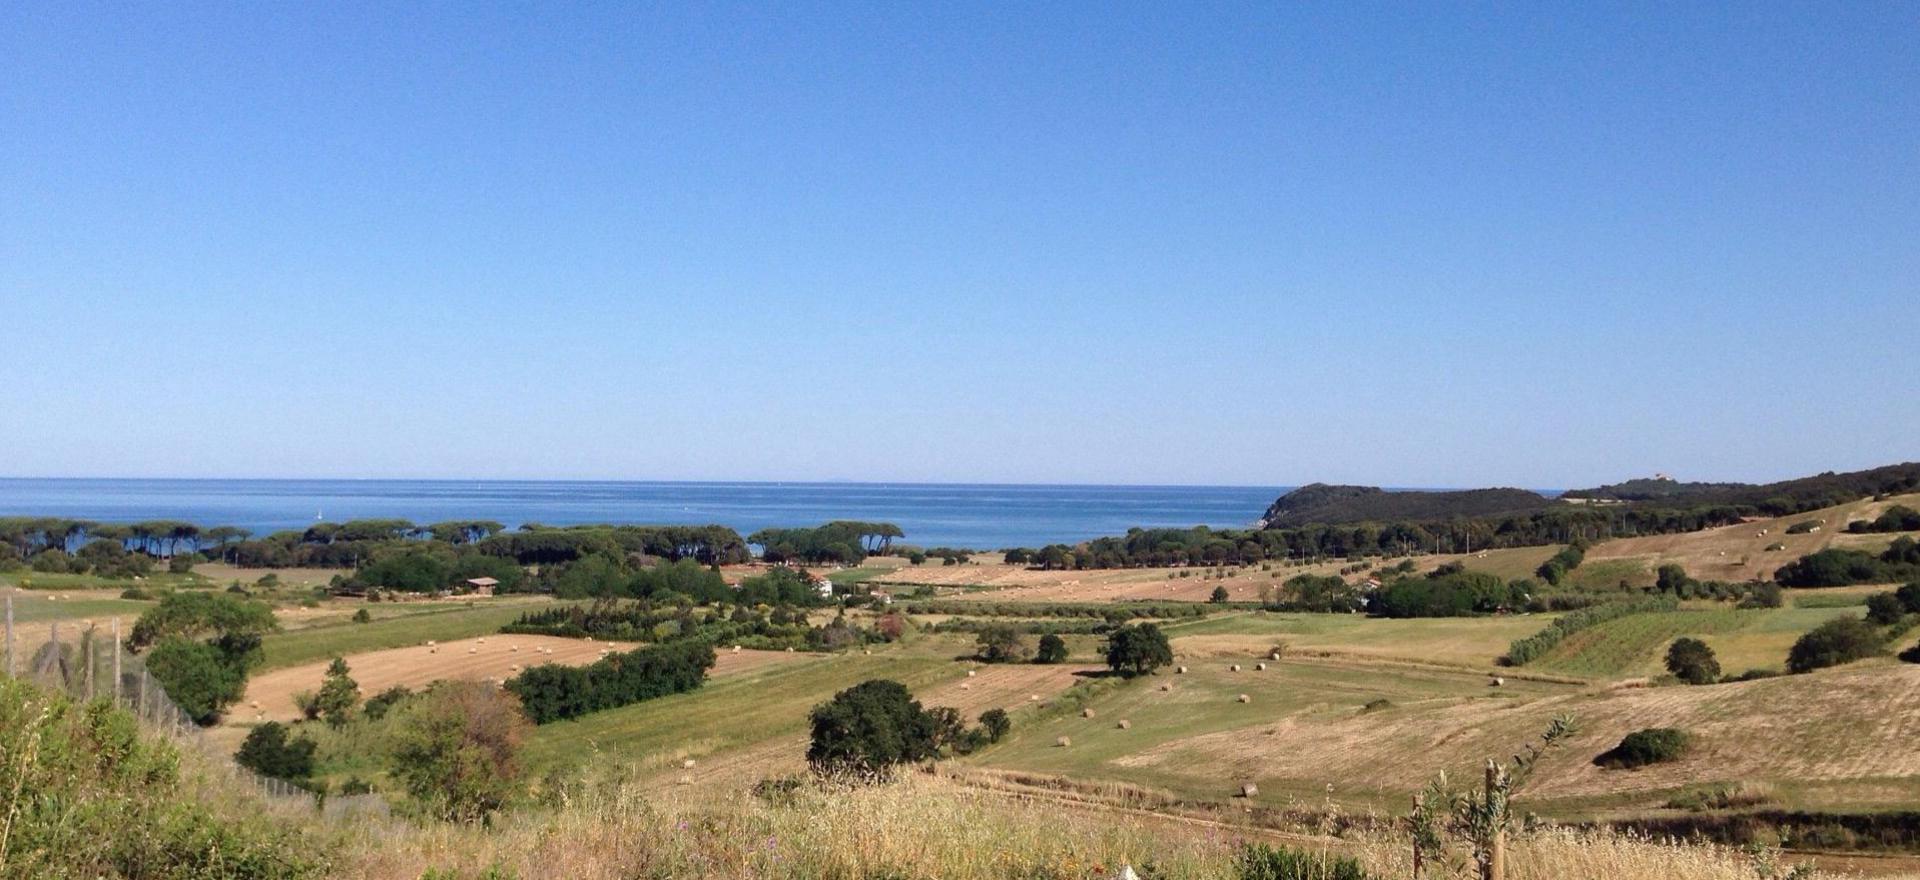 Gastvrije agriturismo in zuid Toscane nabij zee